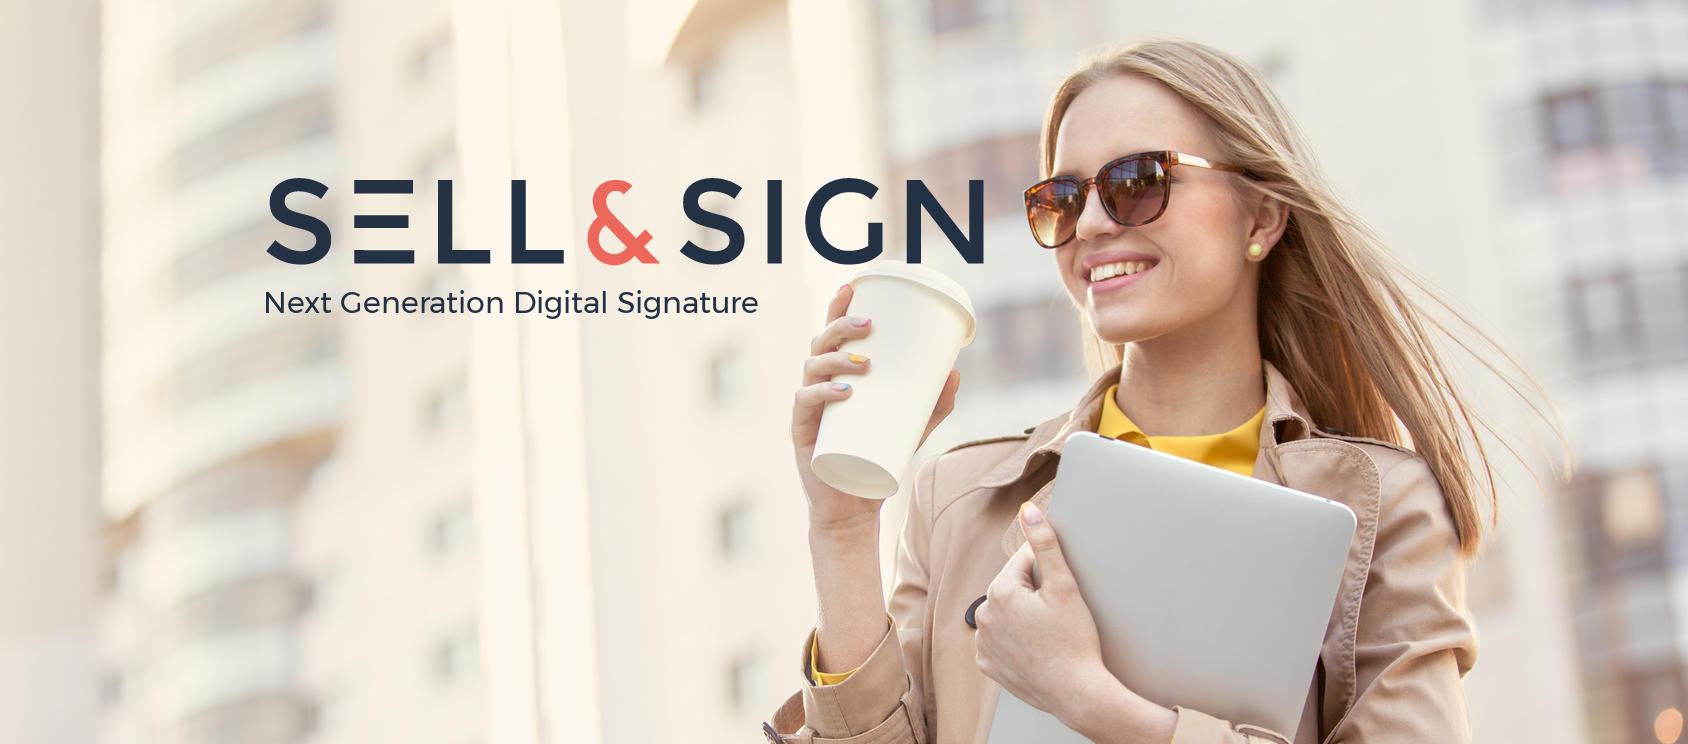 Next Generation Digital Signature Application